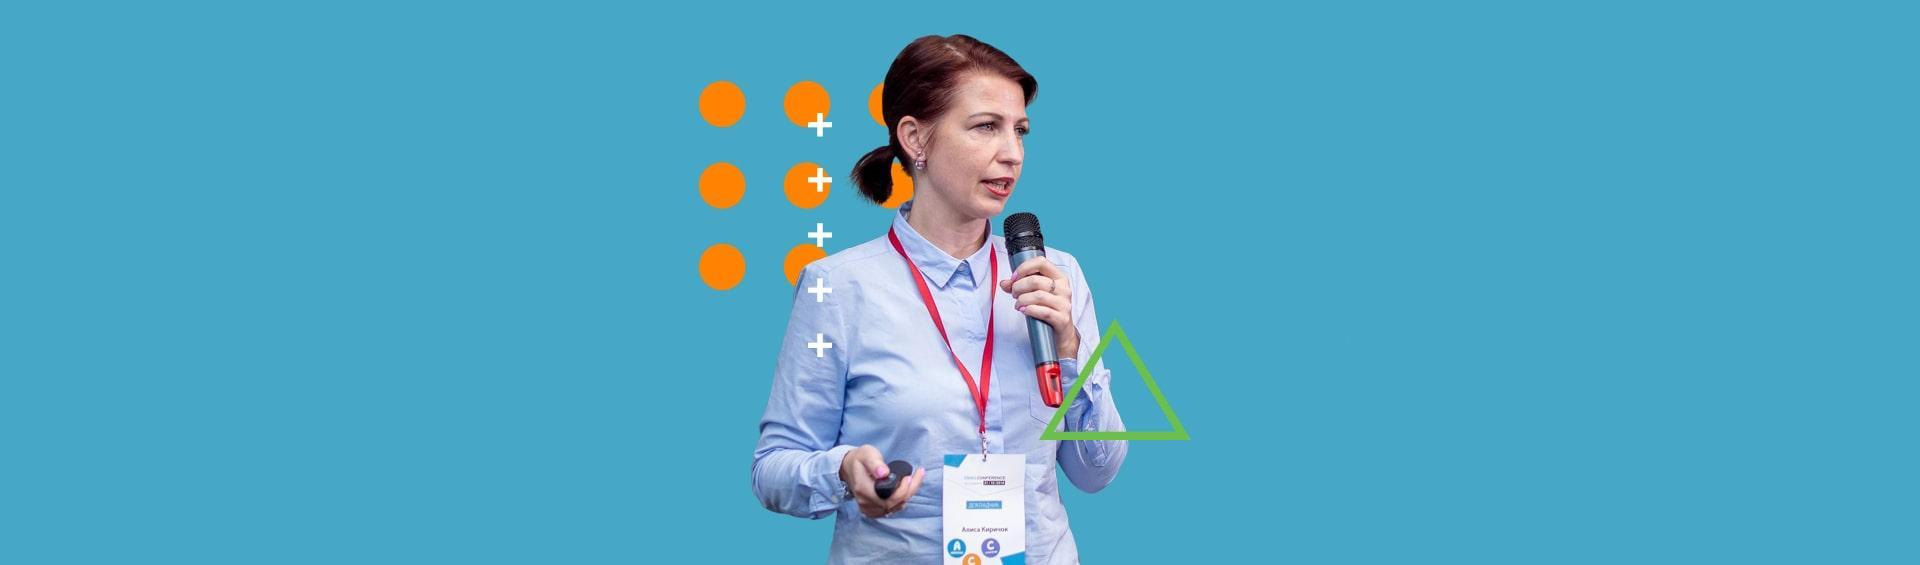 Алиса Киричок, EmailConsulting: опути вdigital ибудущем email-маркетинга